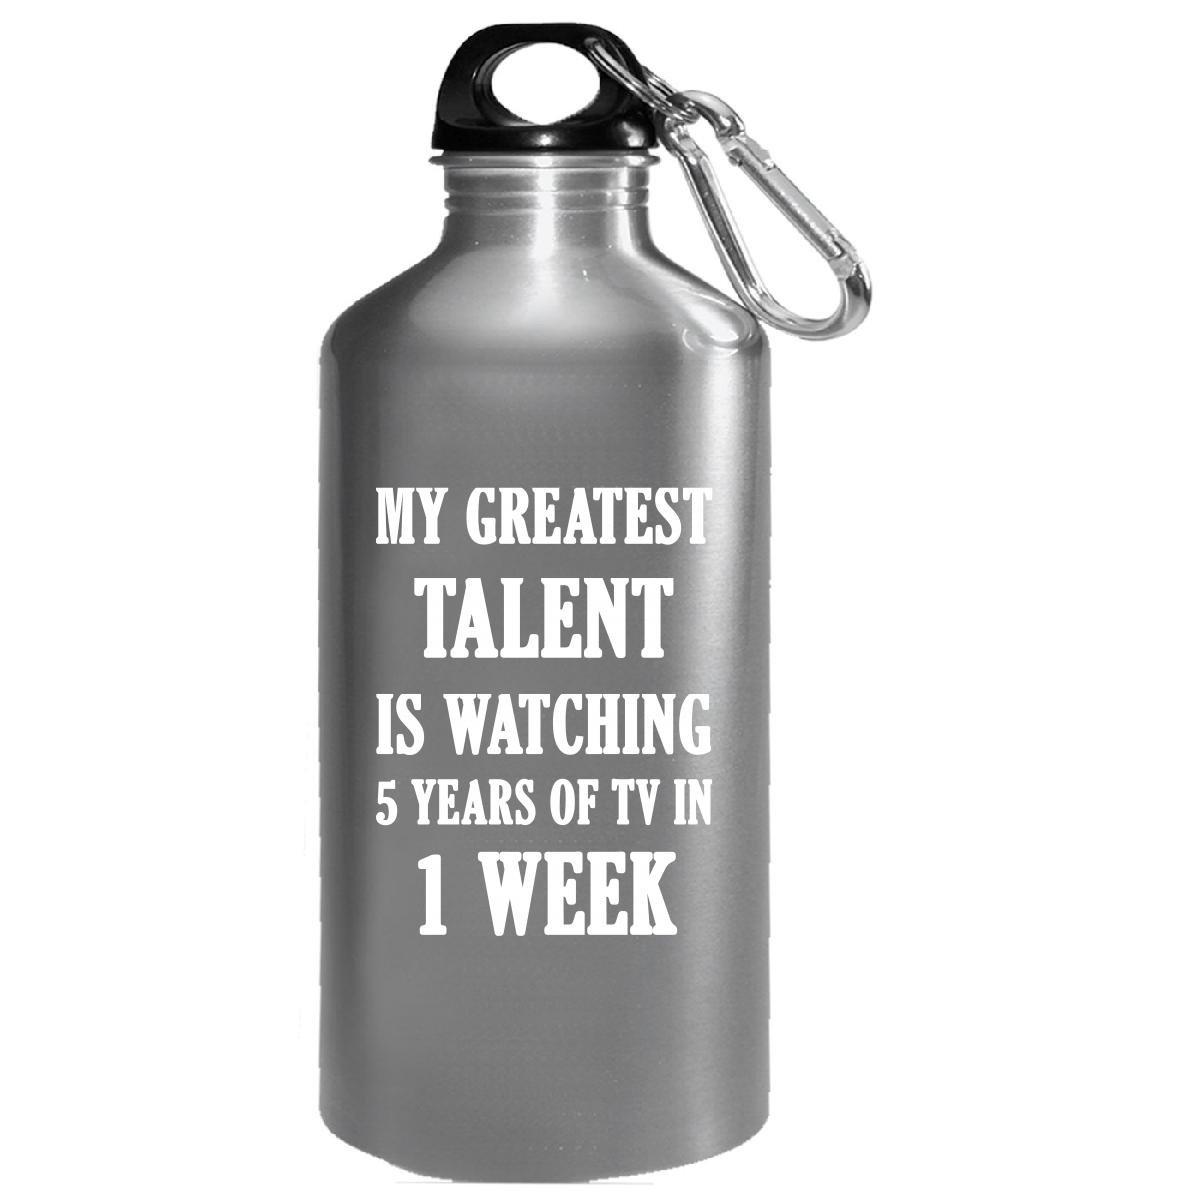 My Greatest Talent Is Watching 5 Years Of Tv In 1 Week - Water Bottle